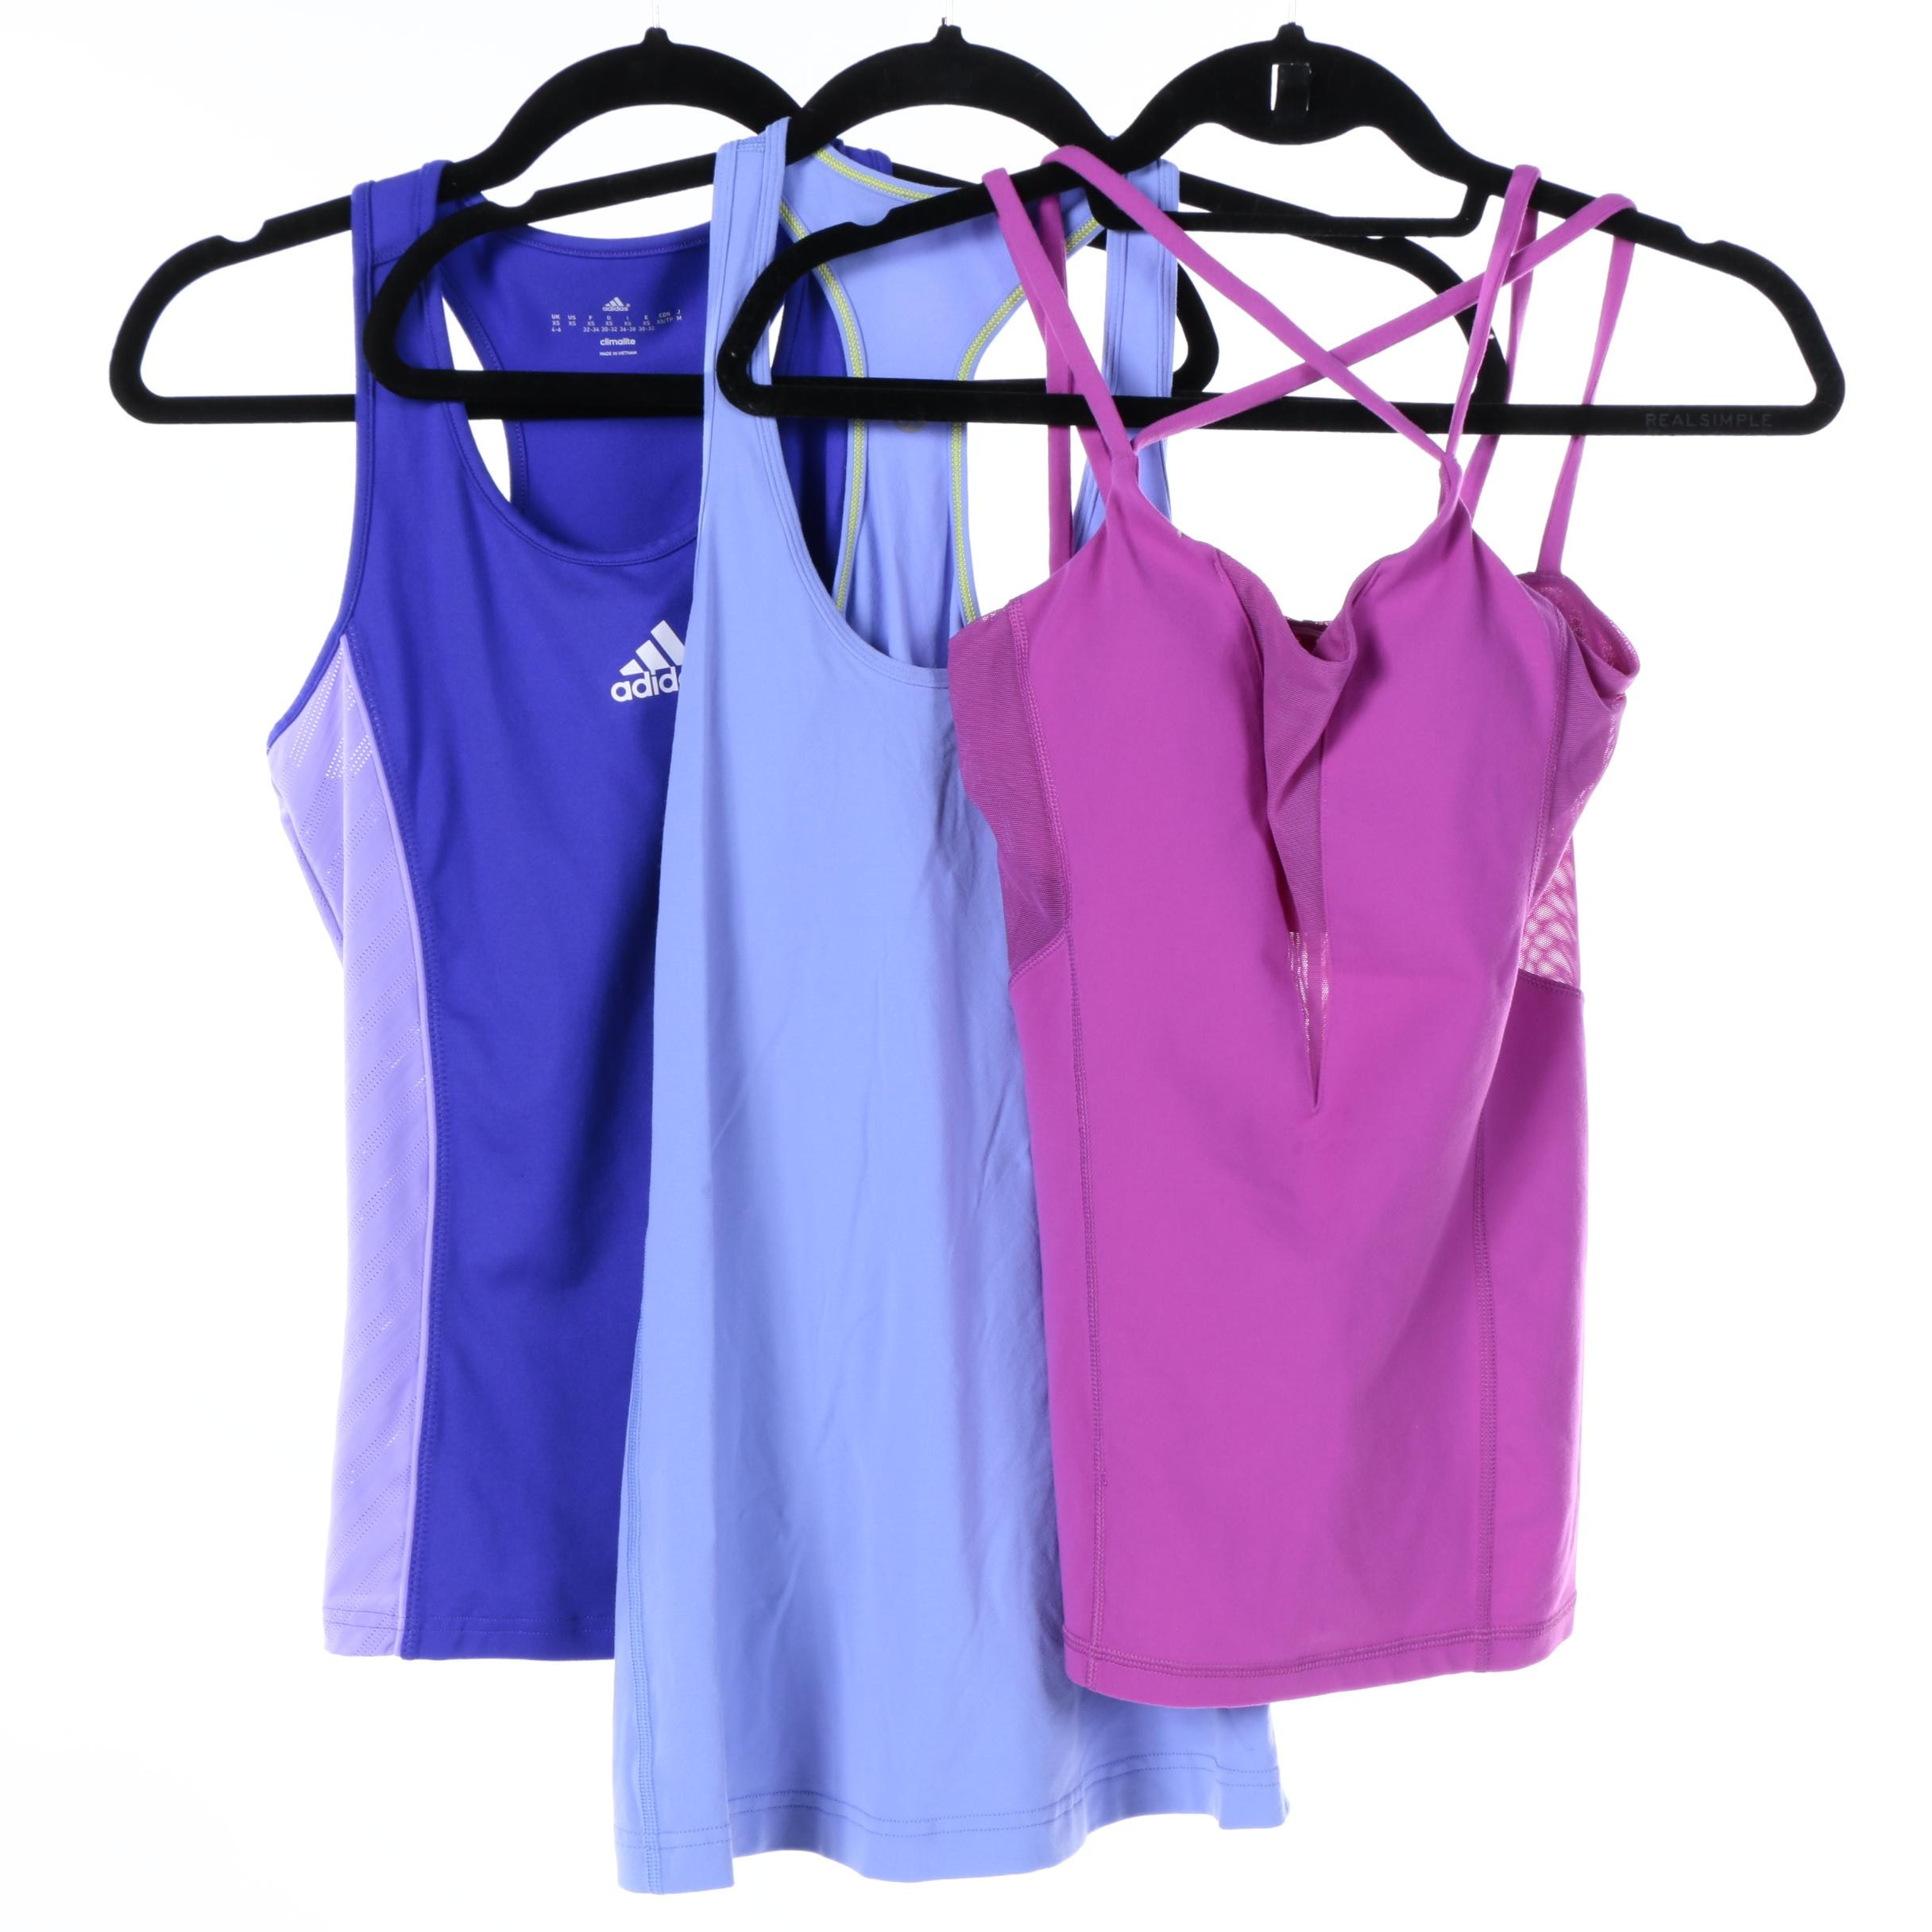 Women's Lululemon and Adidas Athletic Tank Tops